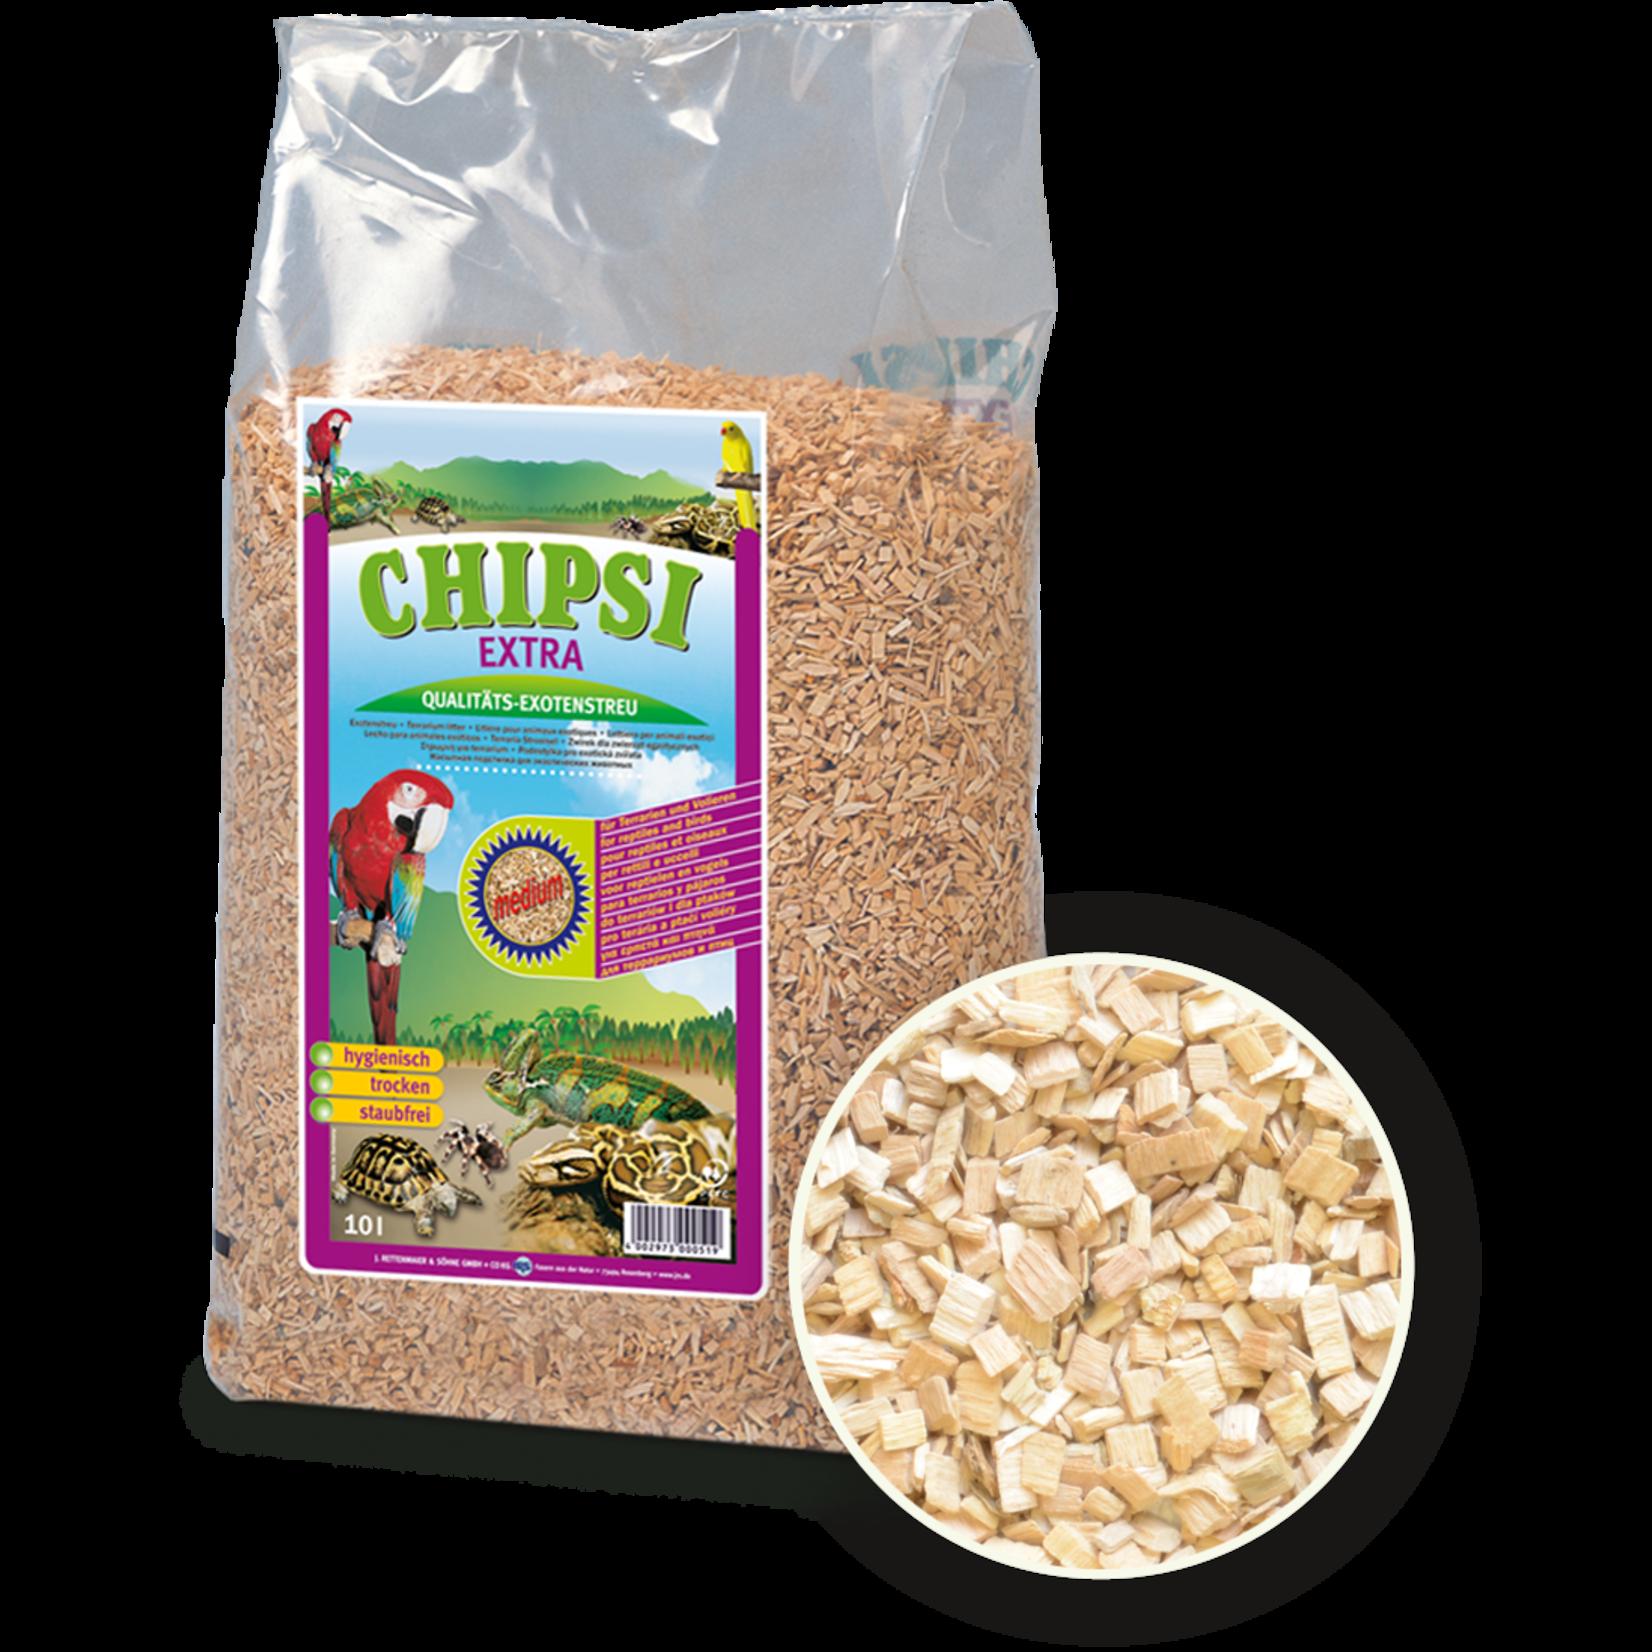 Chipsi Beechwood Bedding Chips, Medium, 10 Litres